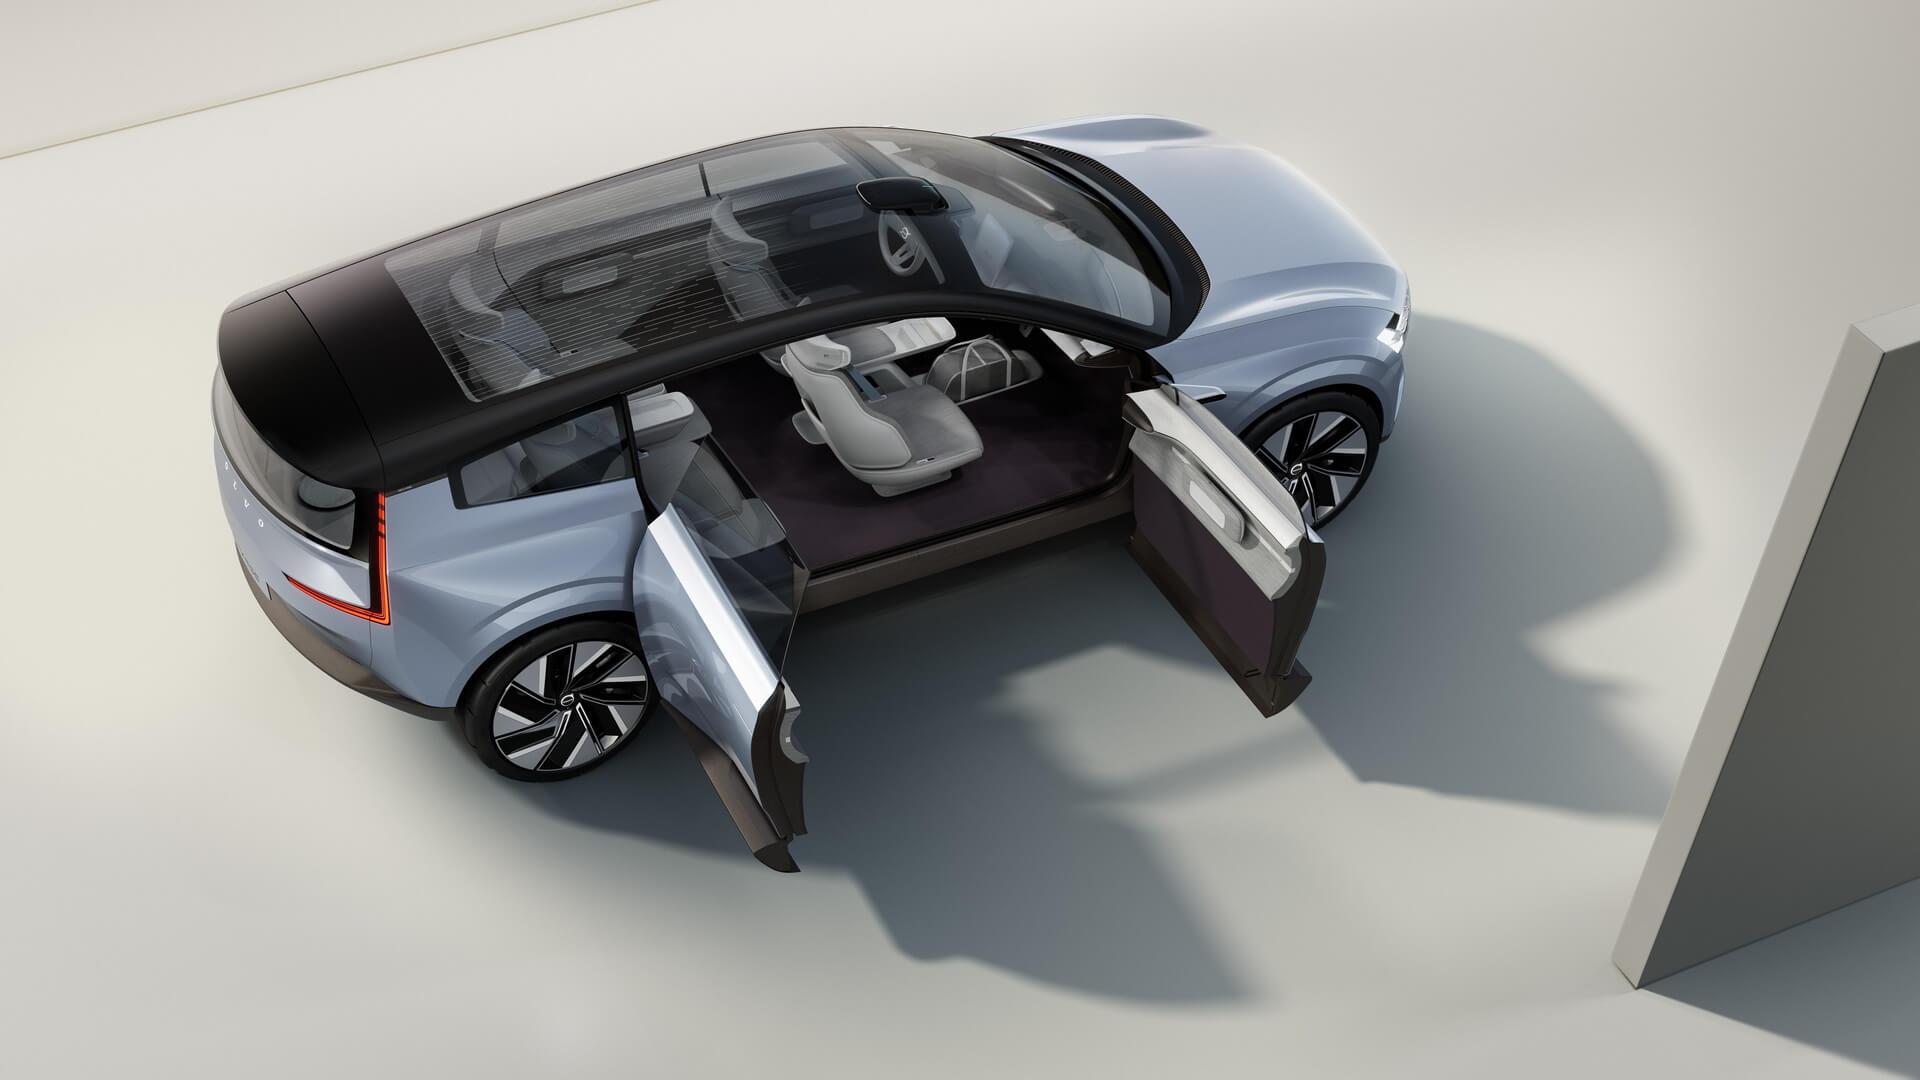 Concept Recharge— взгляд вэлектрическое будущее Volvo Cars